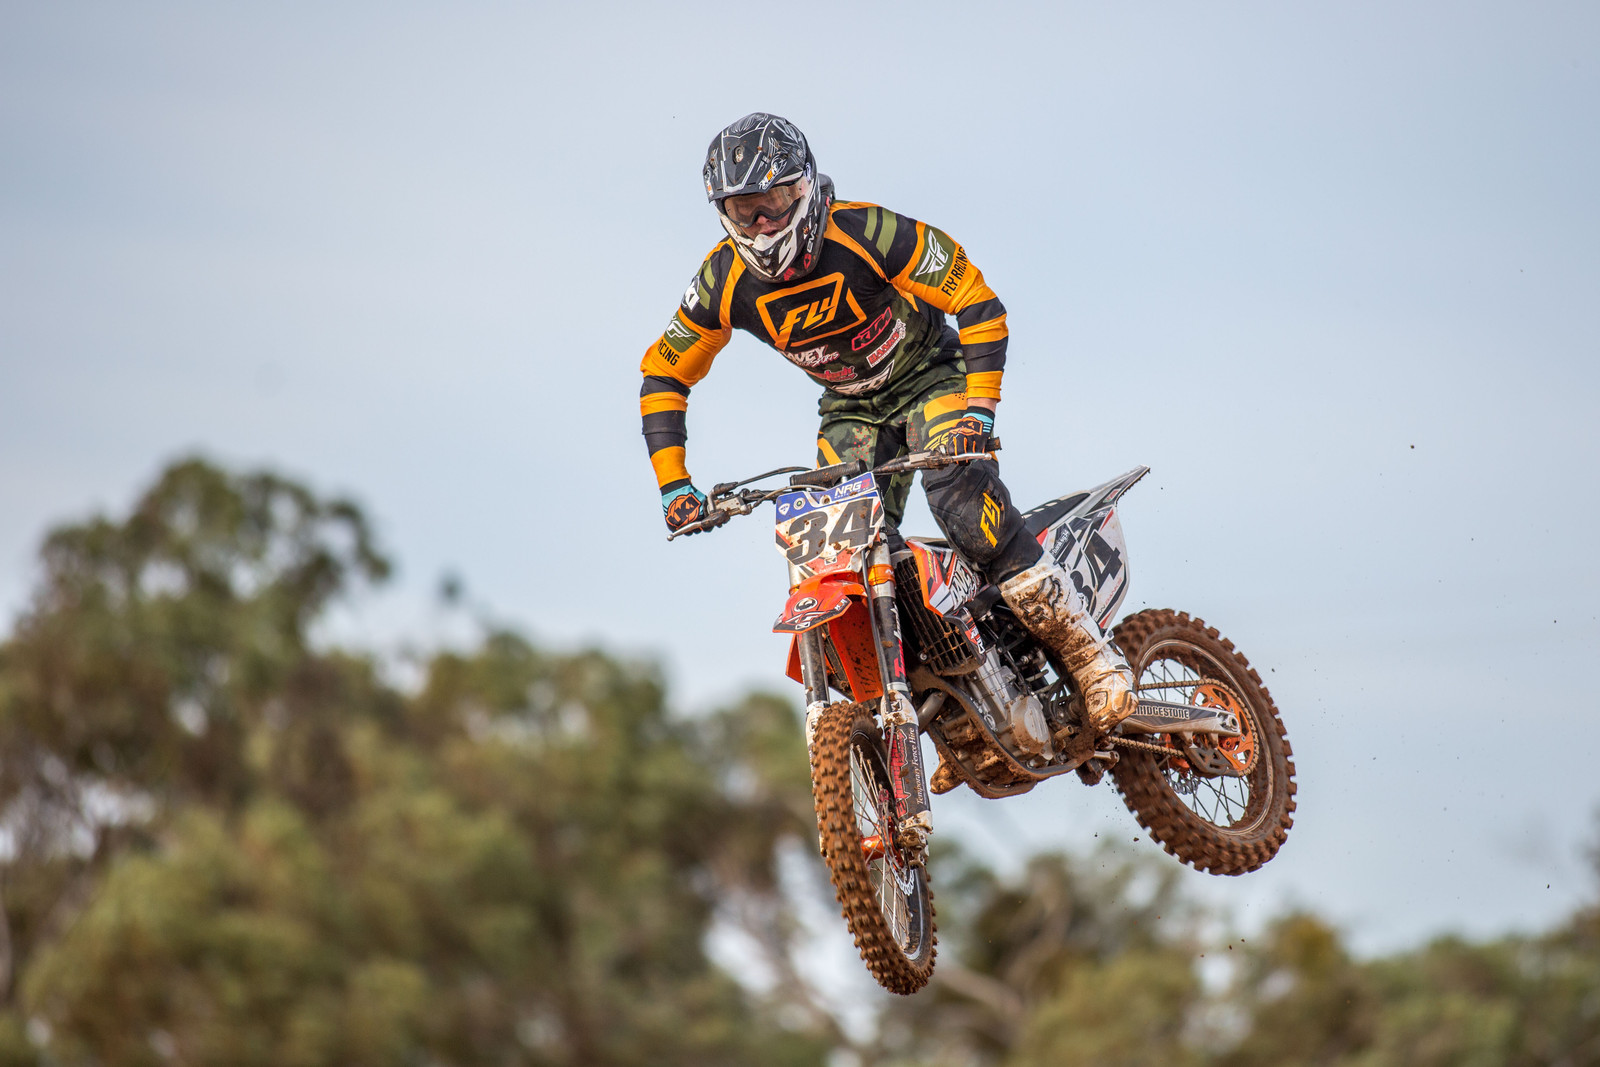 Daniel Banks - Australian Motul Mx Championships: Round 4, Murray Bridge - Motocross Pictures - Vital MX